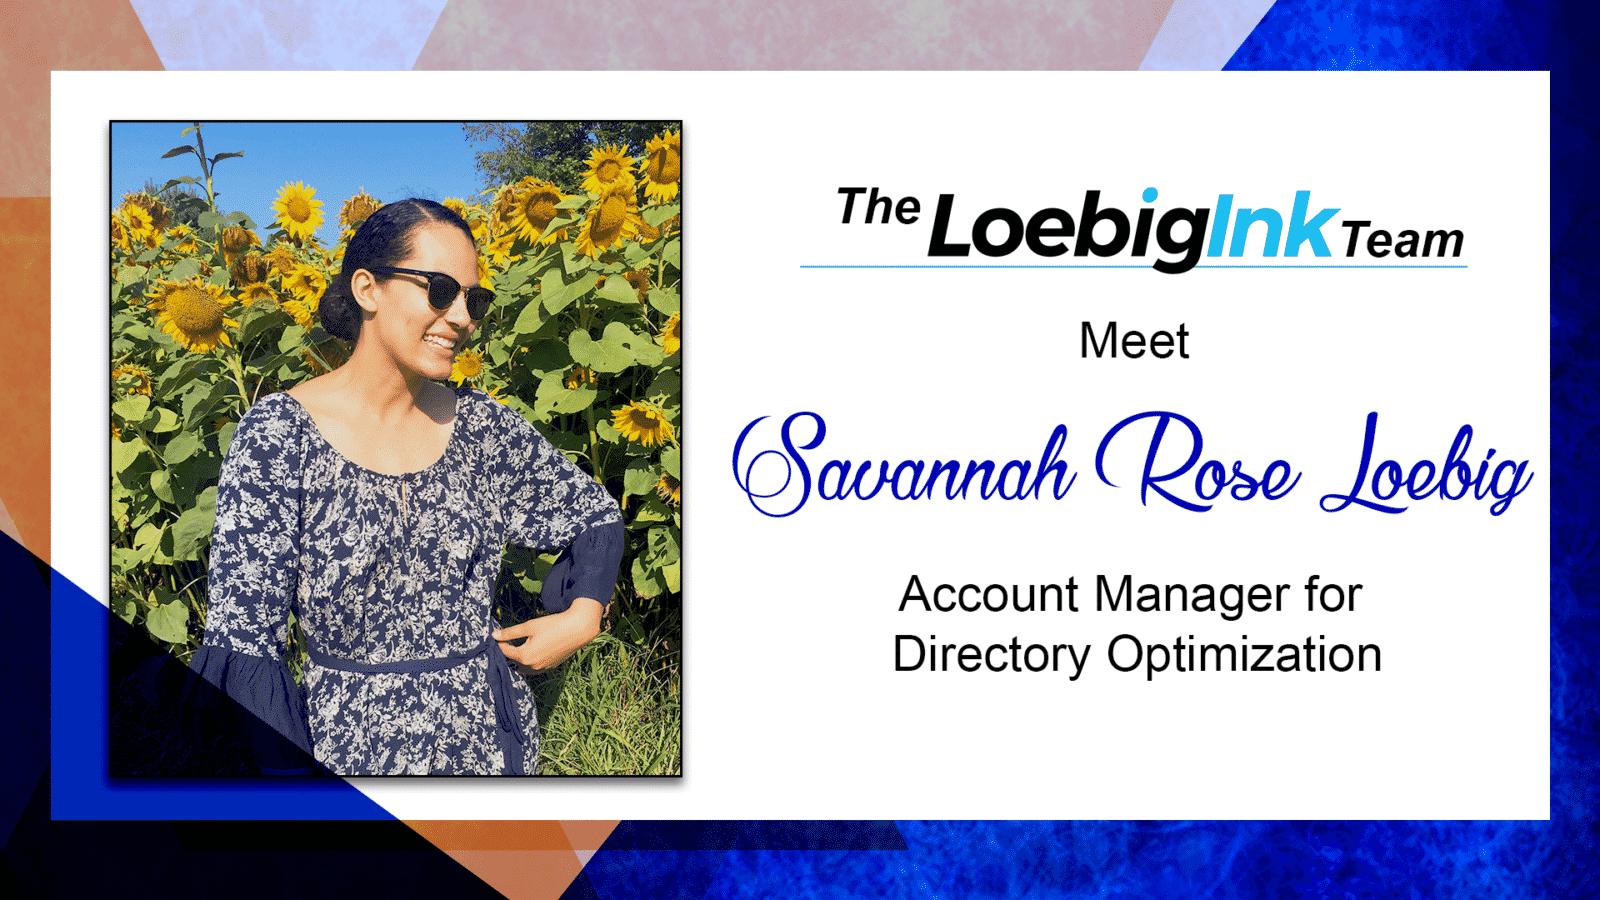 Meet Savannah Rose Loebig - Account Manager for Directory Optimization at Loebig Ink